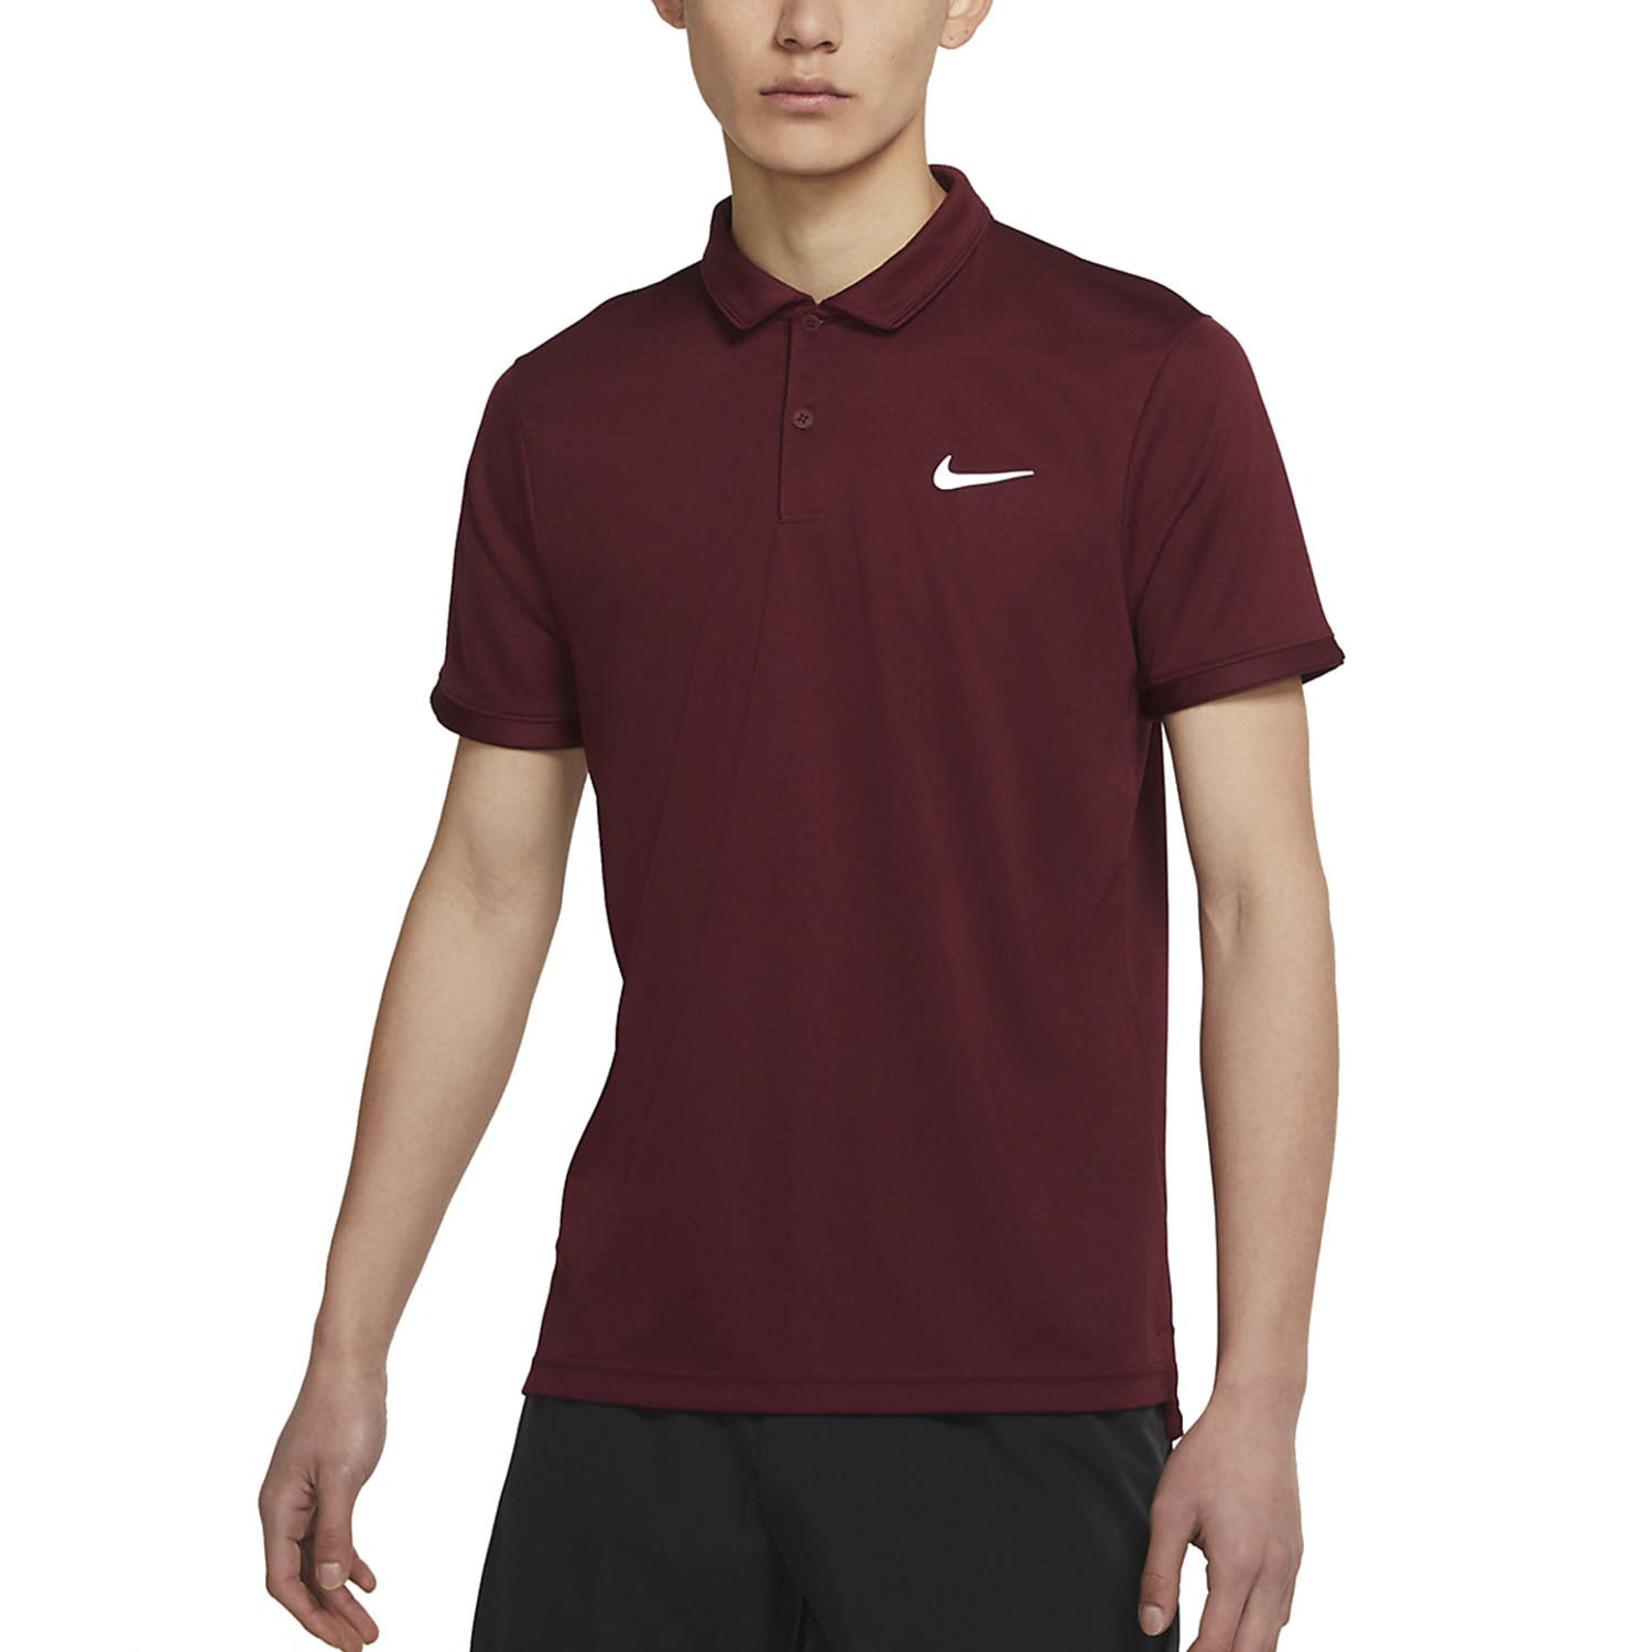 Nike Nike Polo, Court Dri-Fit Victory, Mens